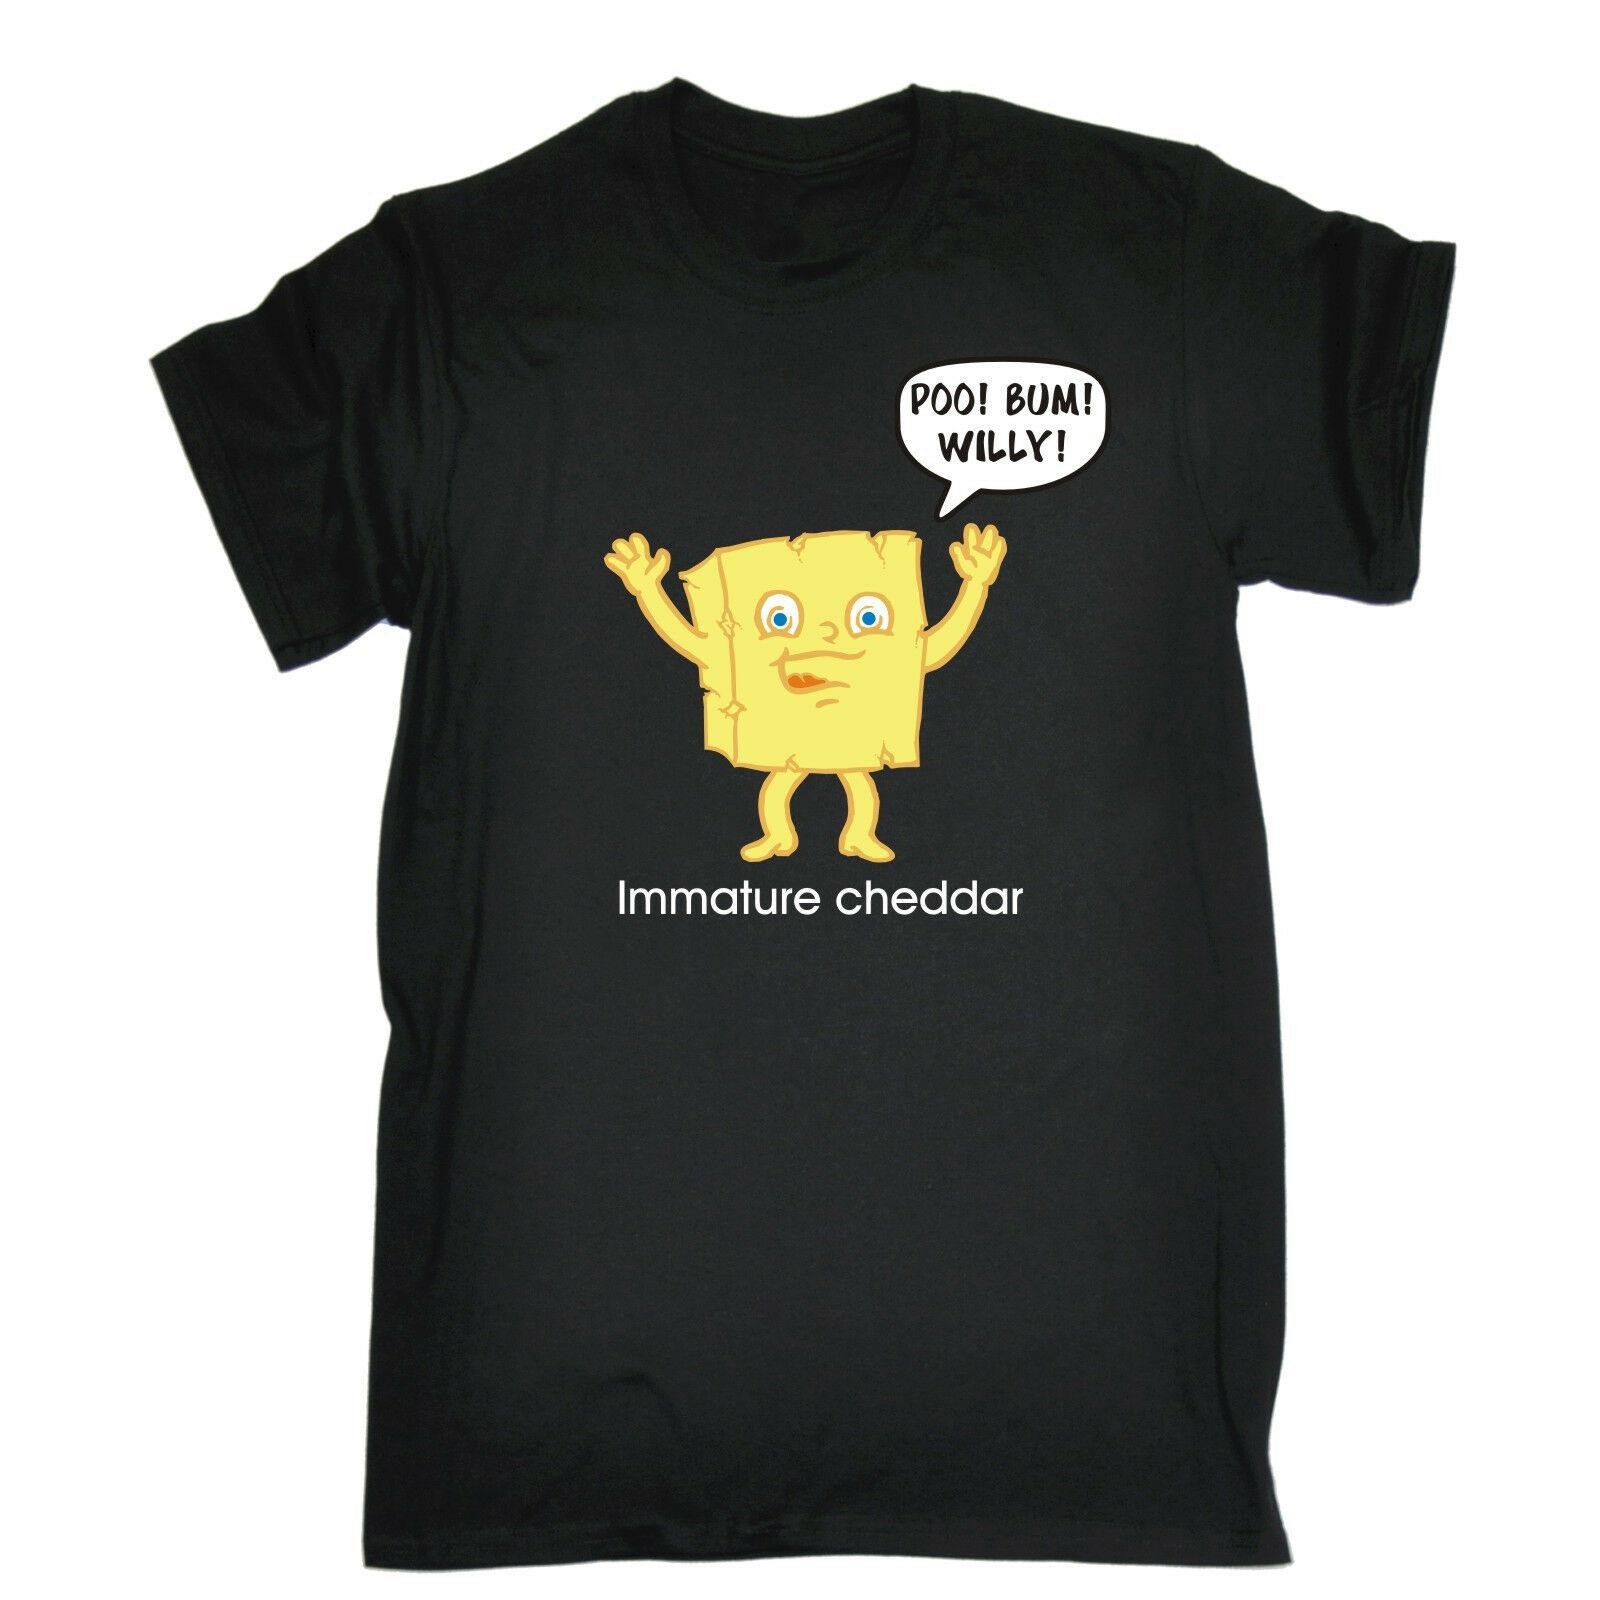 Immature Cheddar Profanity MENS T-SHIRT tee birthday funny rude swearing cheese Cartoon t shirt men Unisex New Fashion tshirt